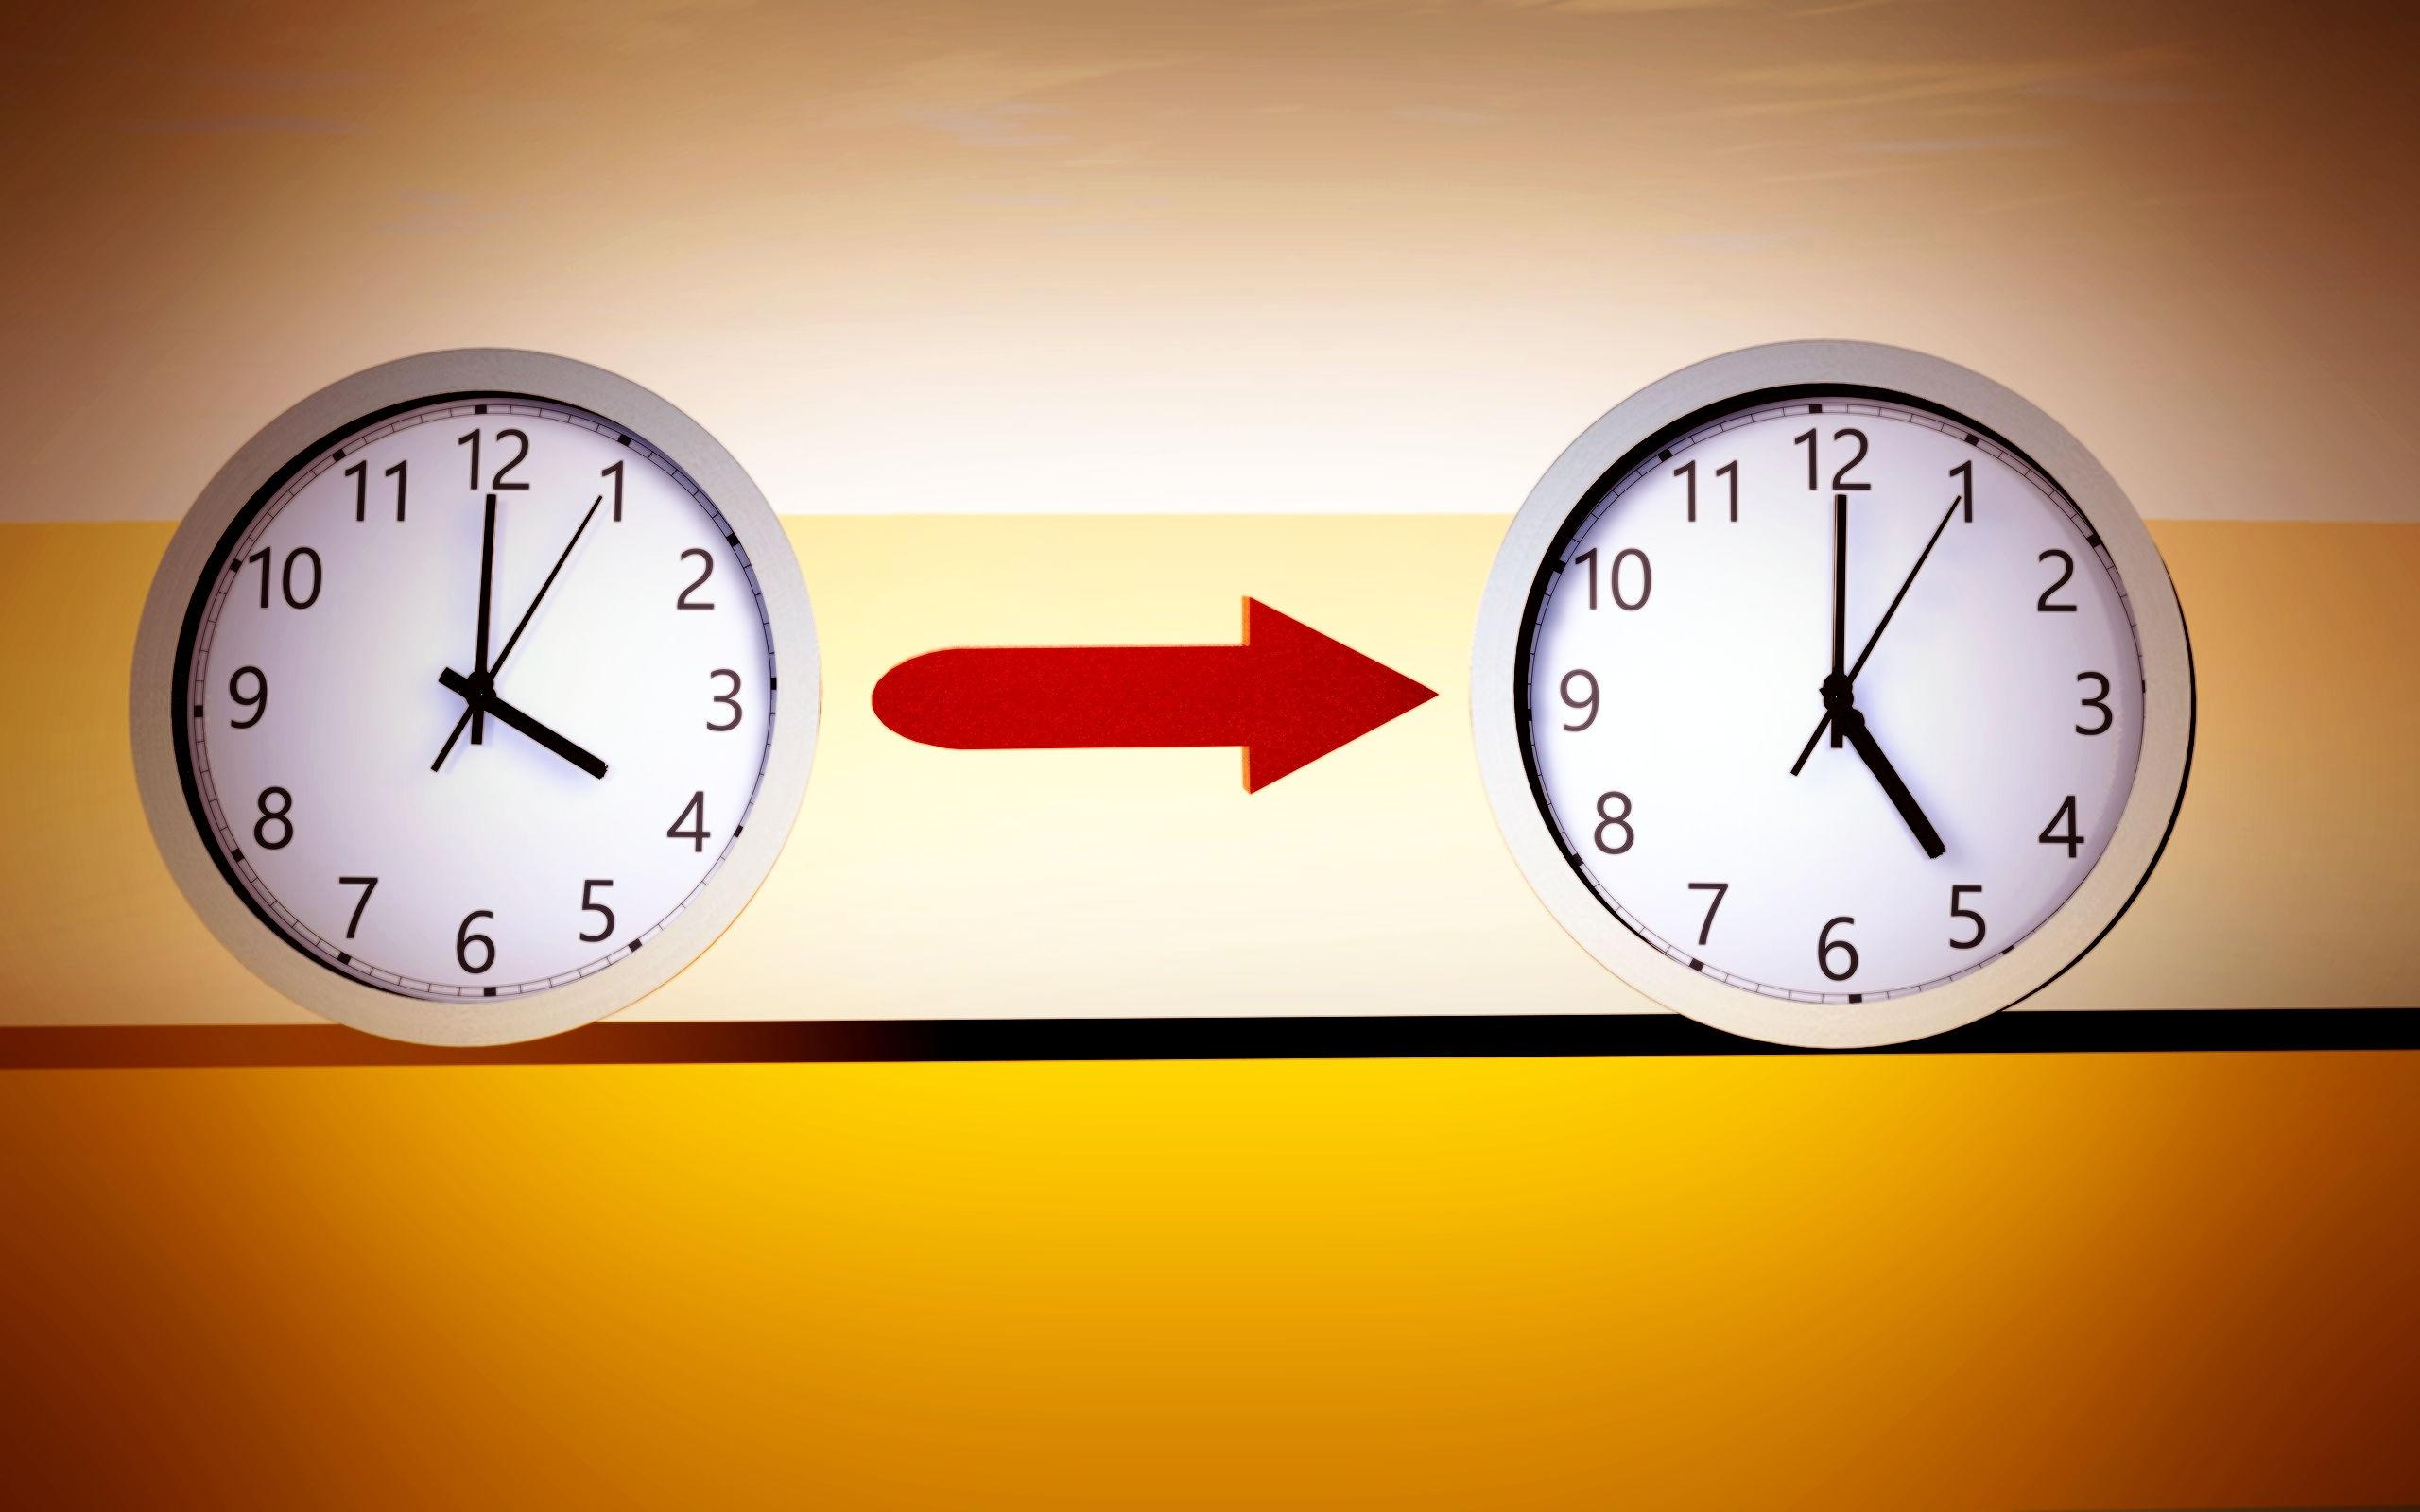 Free Images : number, alarm clock, gauge, decor, dial, circle ...